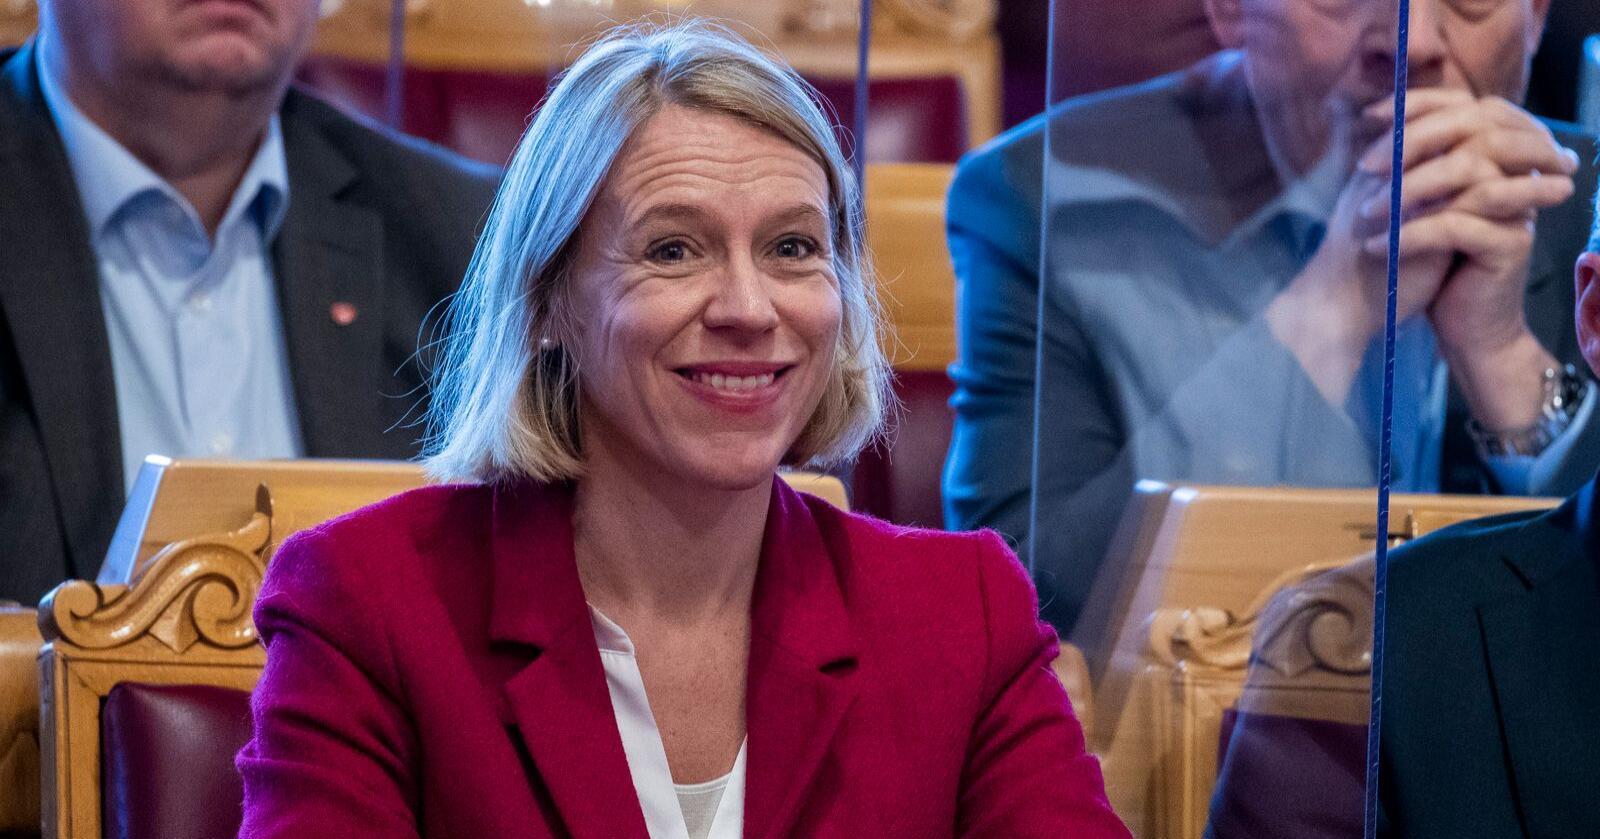 Arbeiderpartiets Anniken Huitfeldt er i ferd med å sluttføre samtalene om ny forsvarsstruktur i Stortinget. Foto: Terje Pedersen / NTB